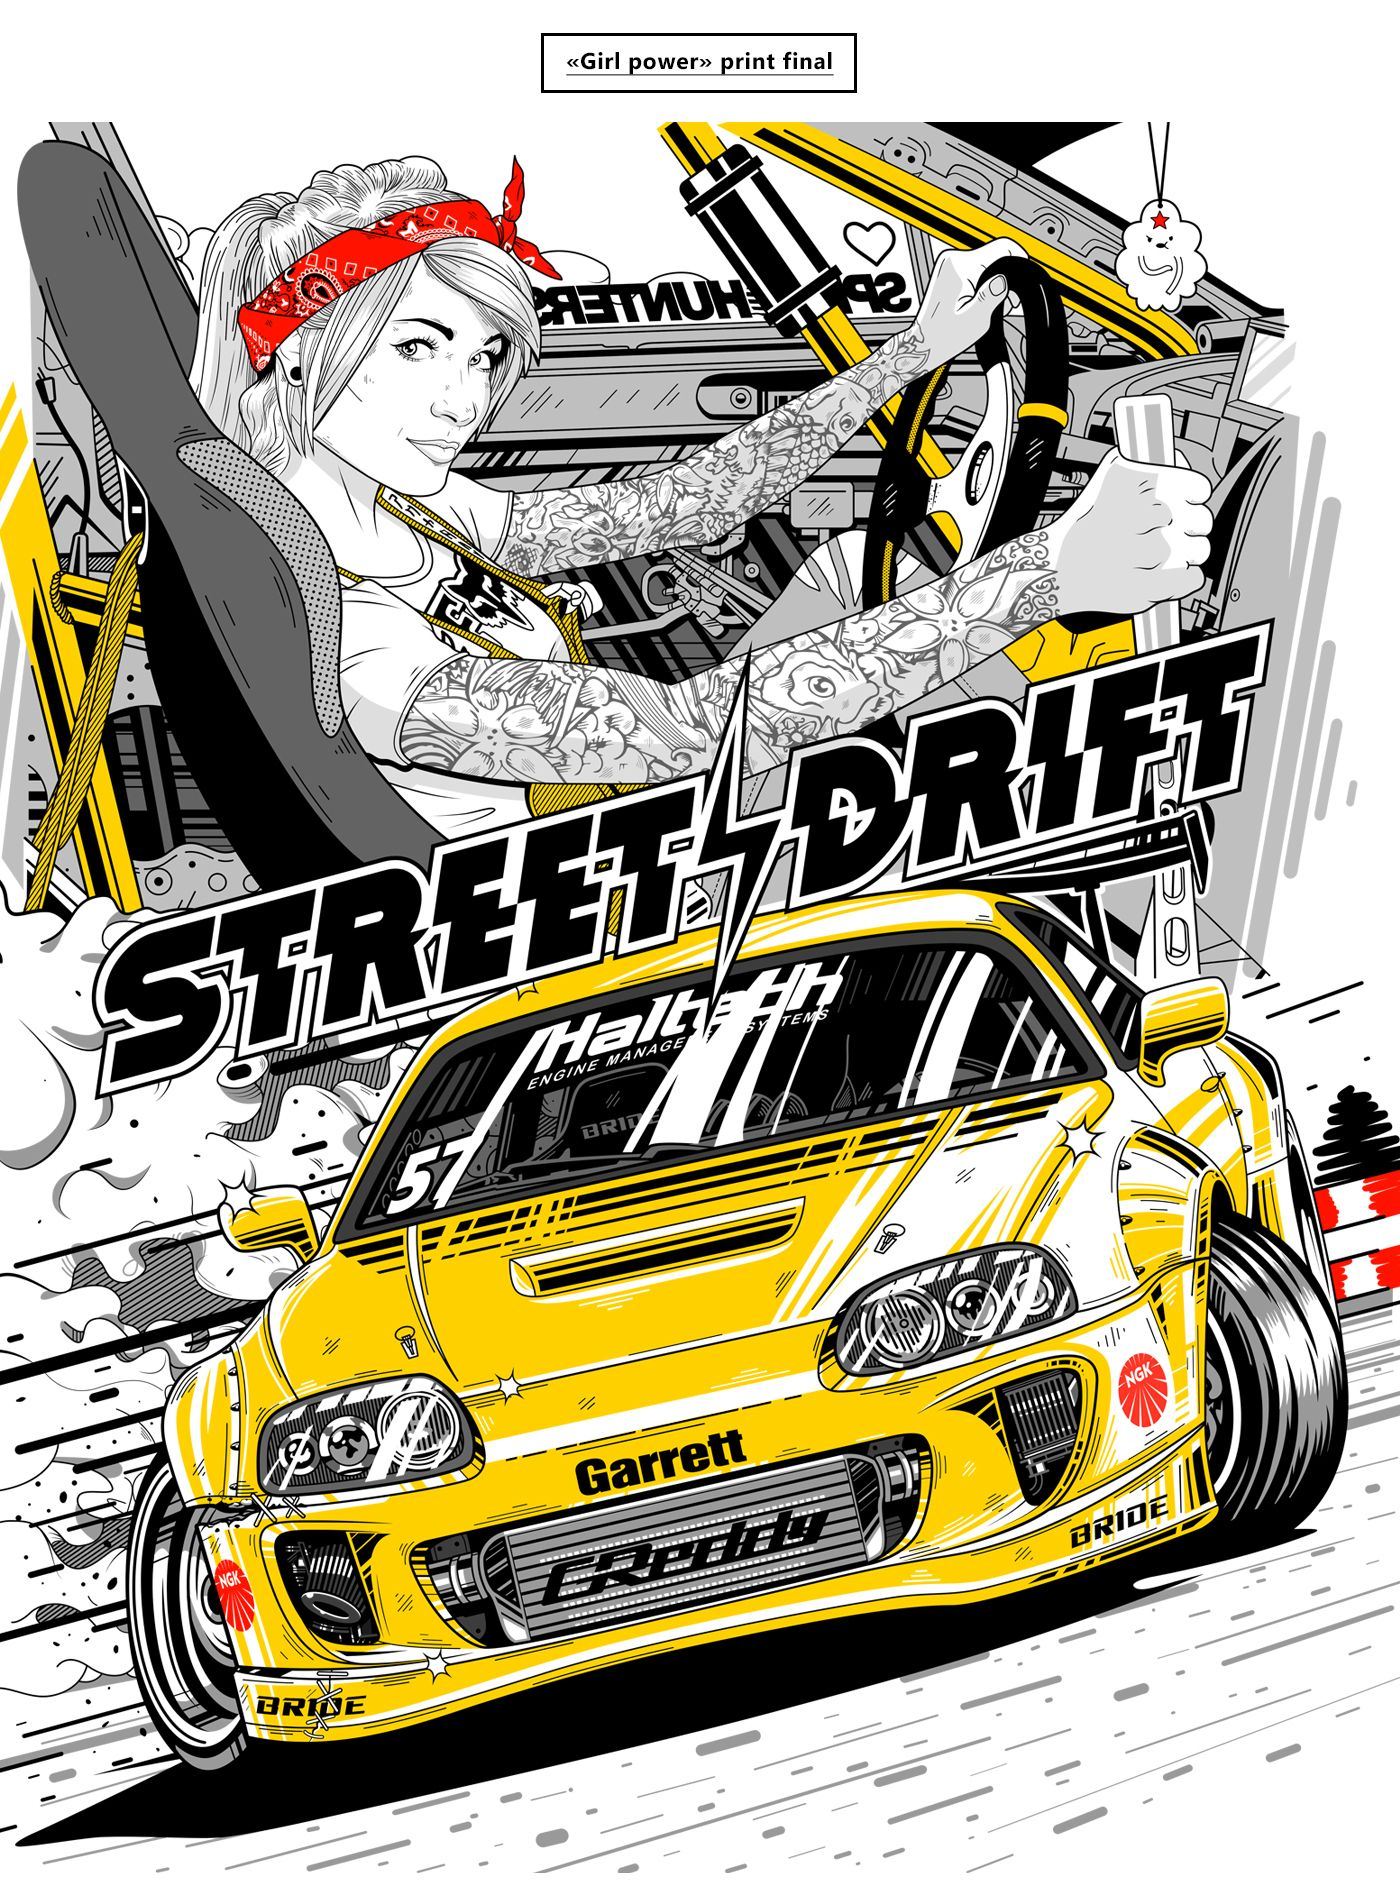 Pin By Mrzayd Muztaffa On Cars Amp Motorcycles Illustration